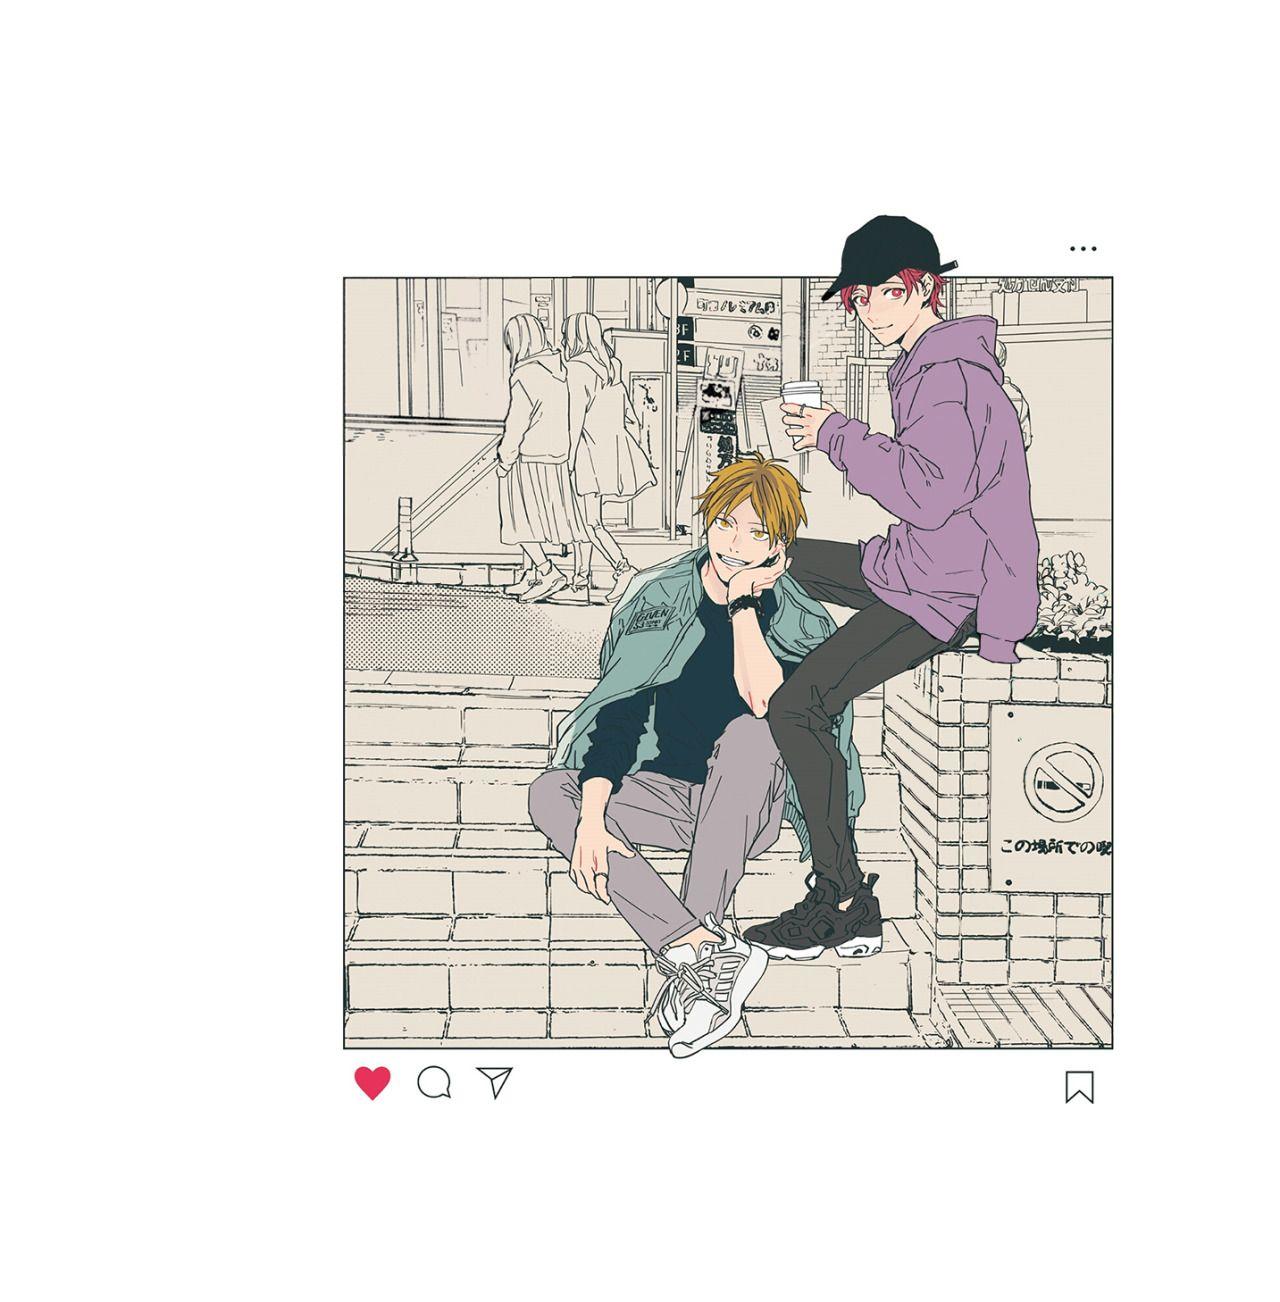 Given || Taken — givenplus: Given - Illustrations ⌜ Haruki ...